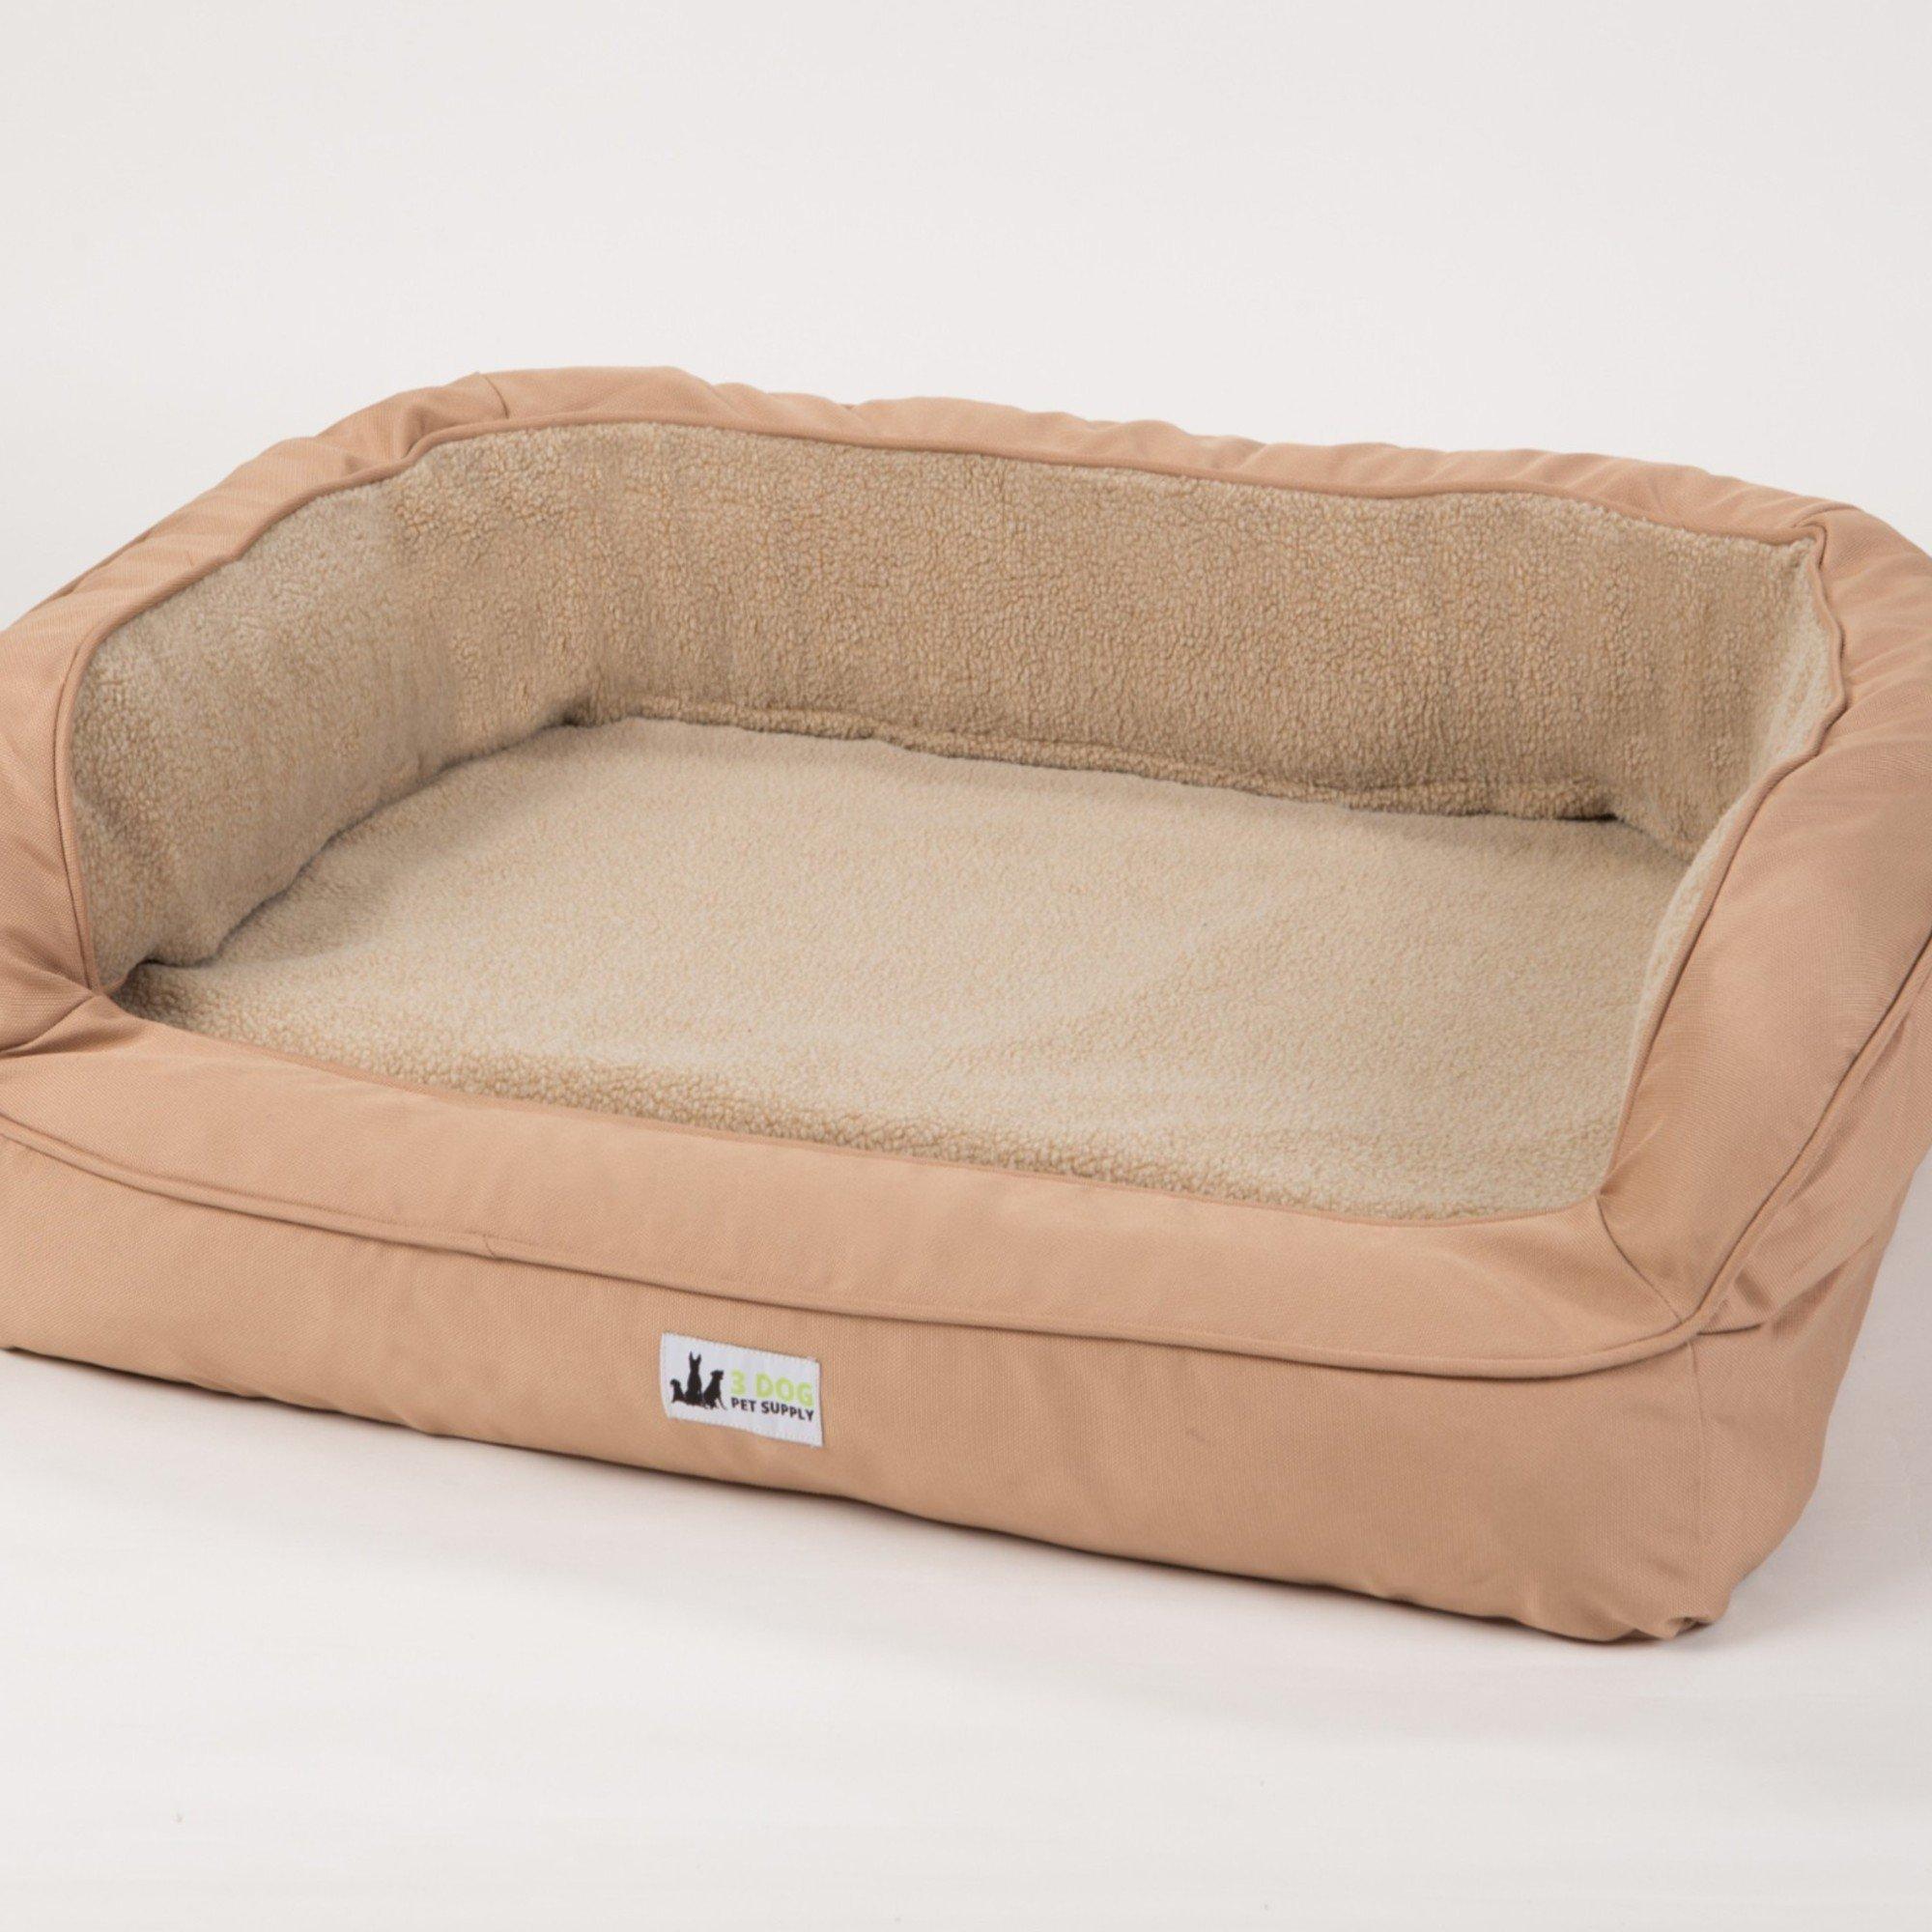 "3 Dog EZ Wash Fleece Bolster Tan Dog Bed, 38"" L X 26"" W X 10"" H, Medium"